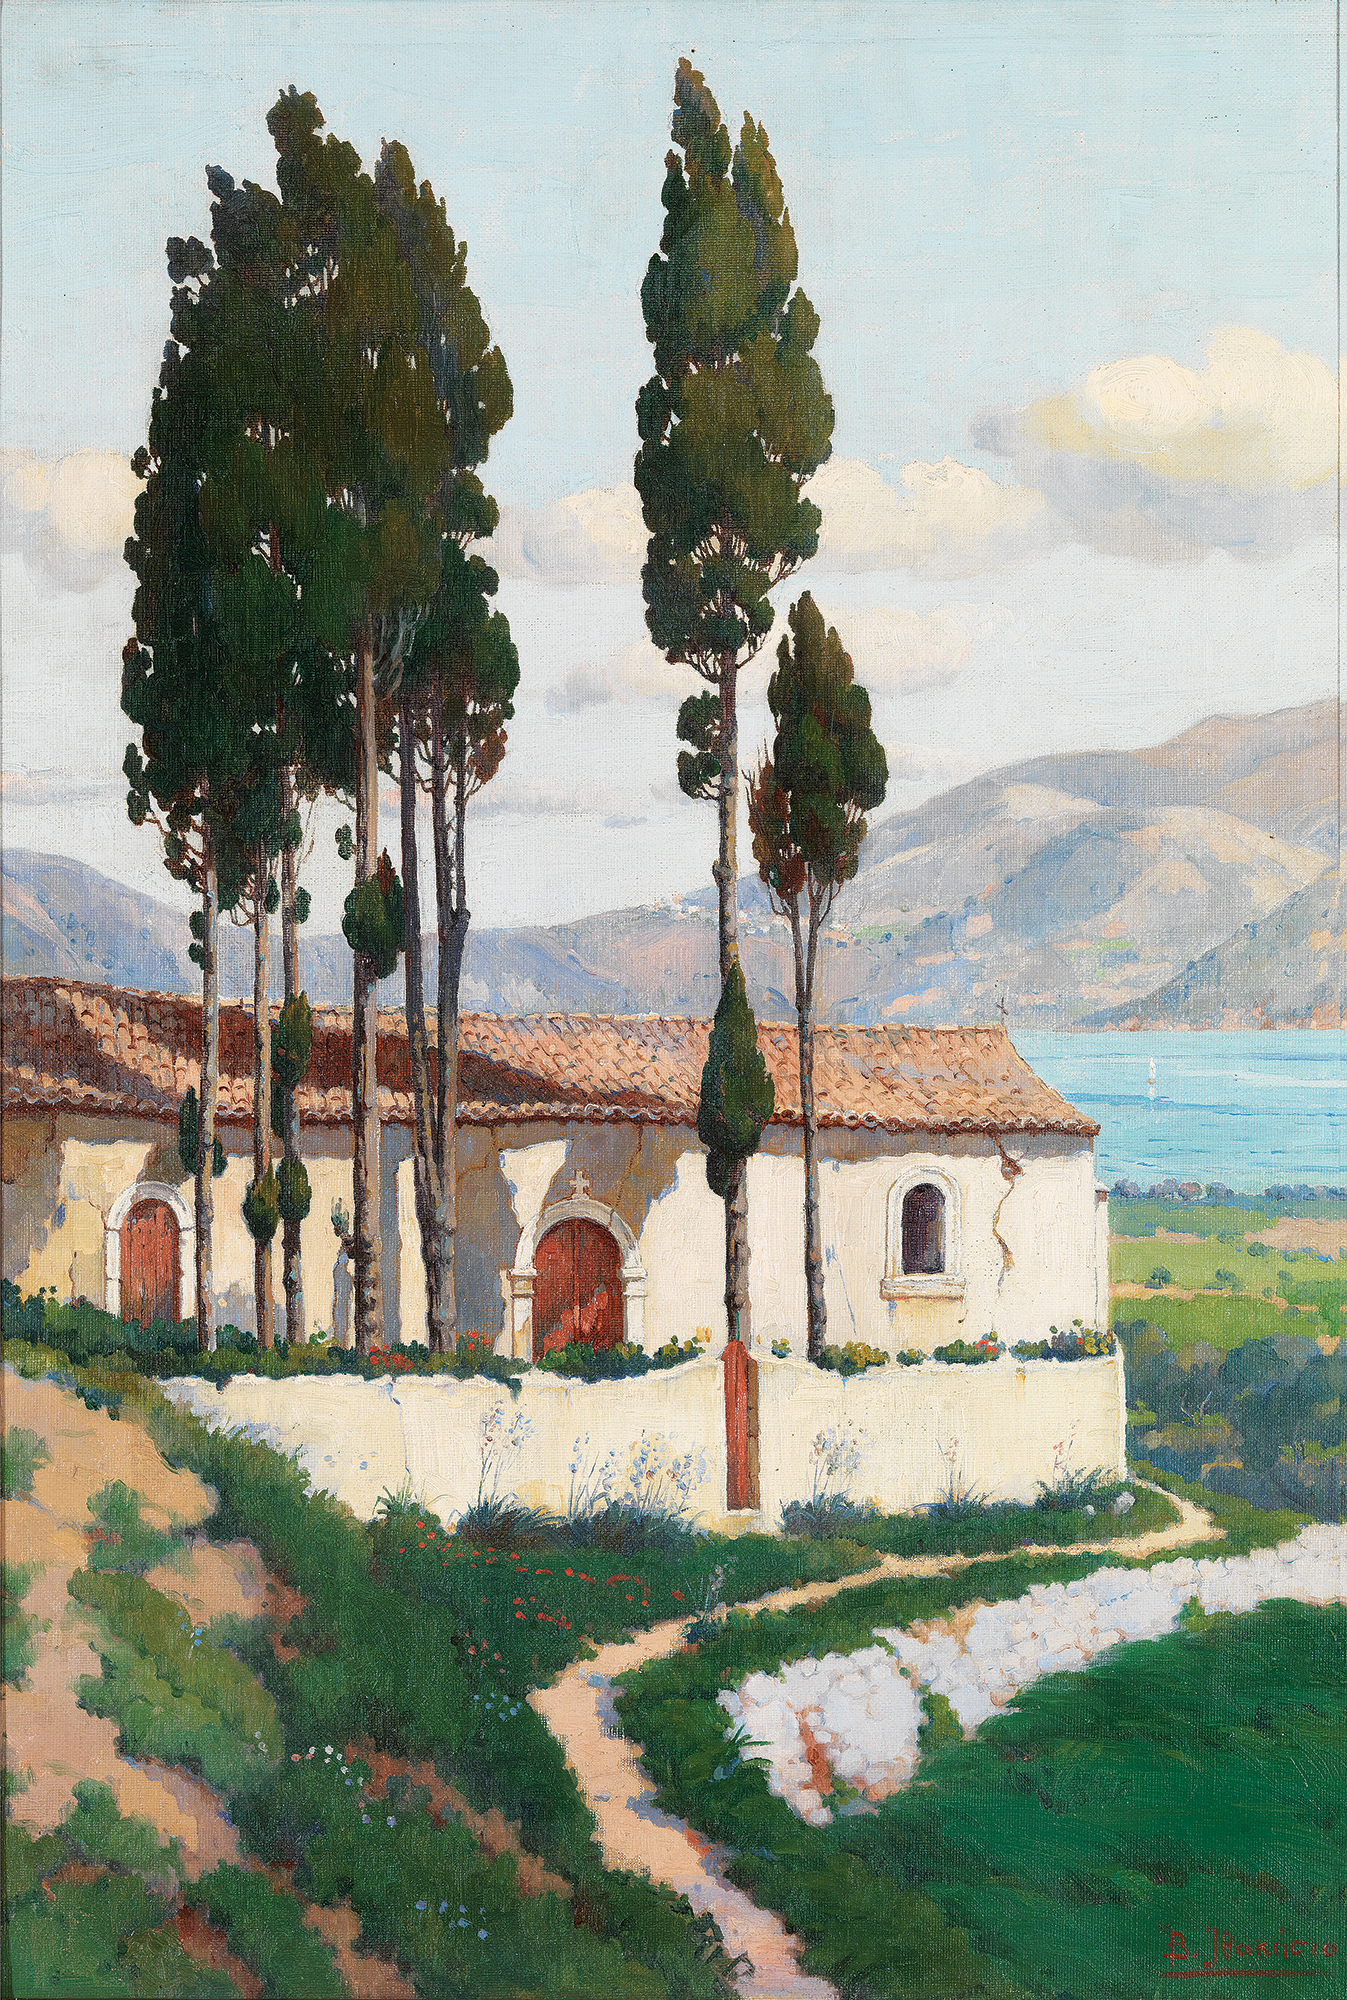 Vassilis Ithakisios - Church in a mountain landscape